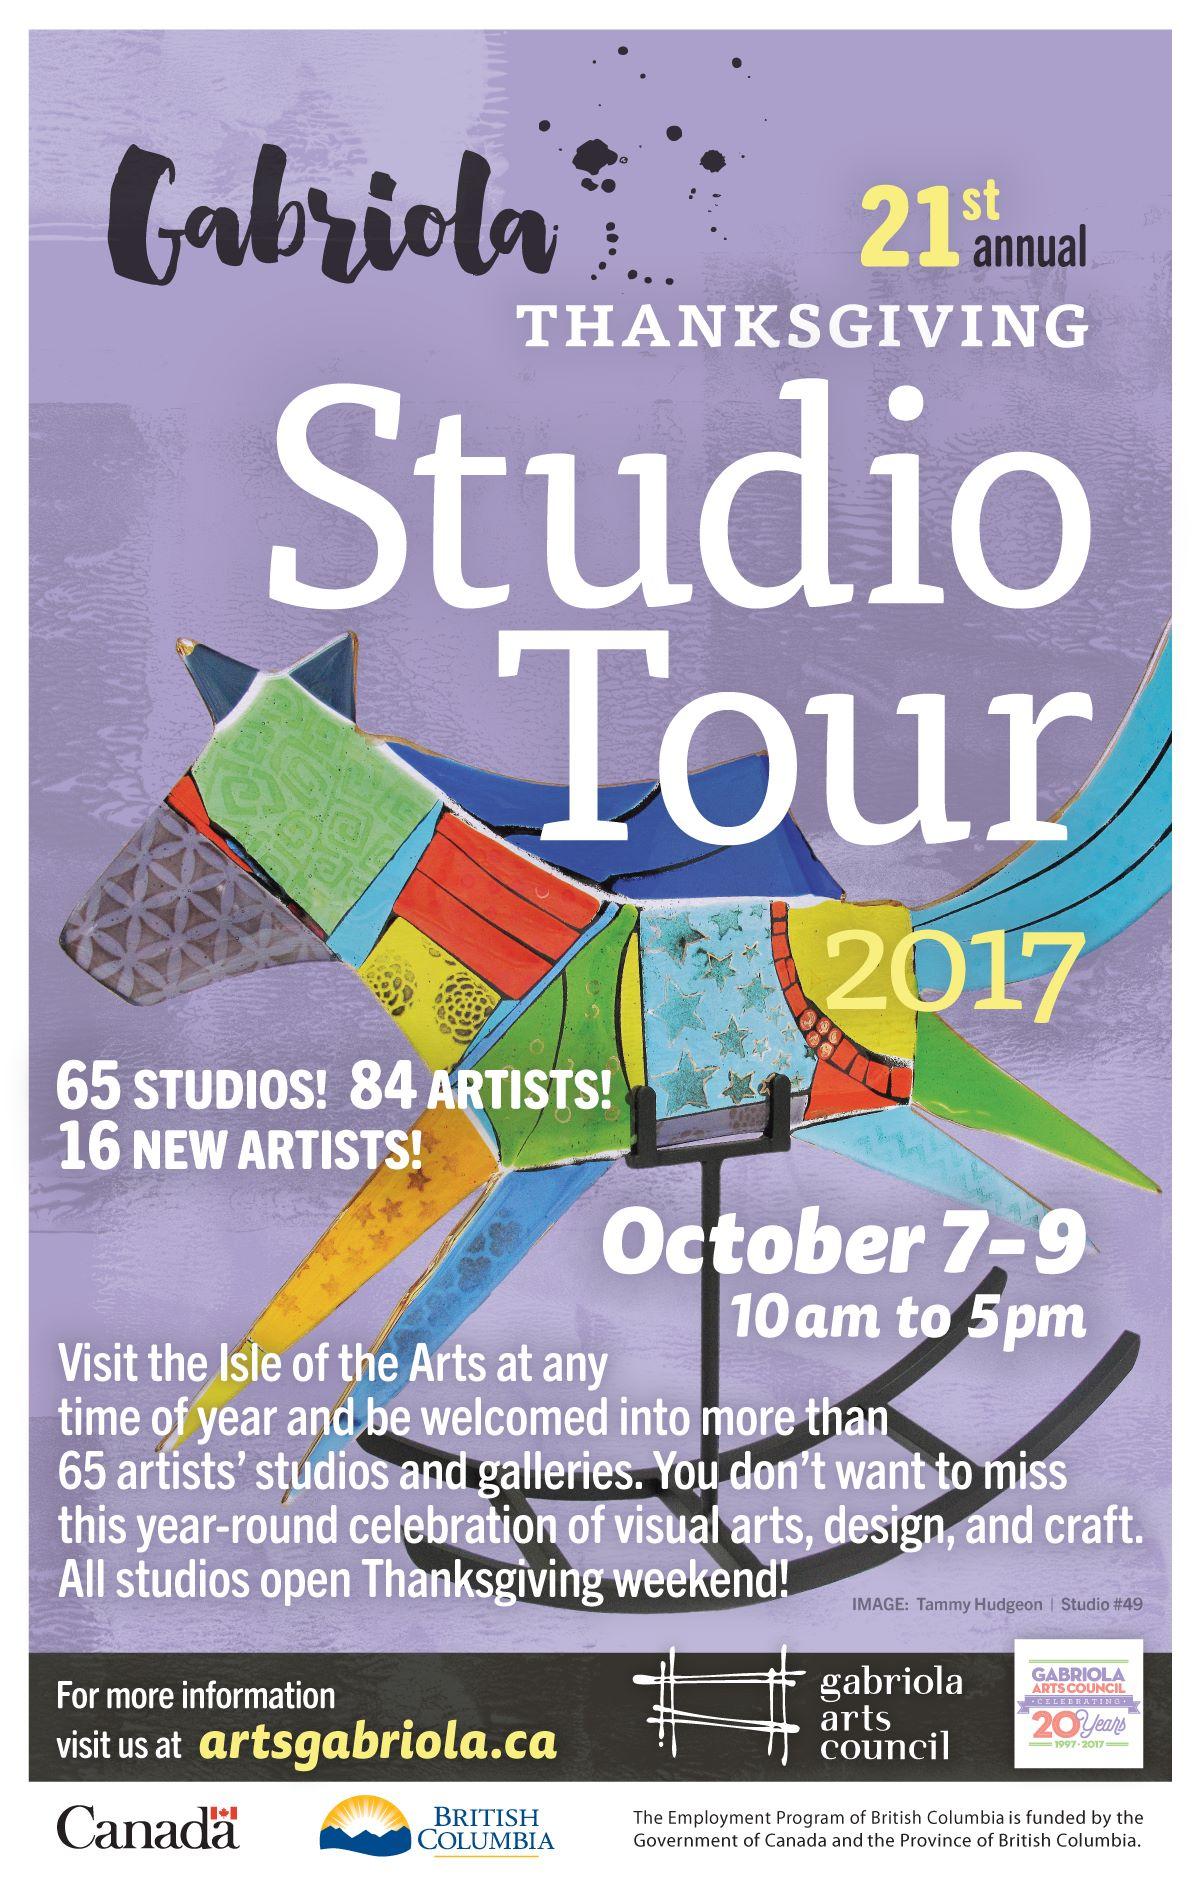 Gabriola Studio Tour